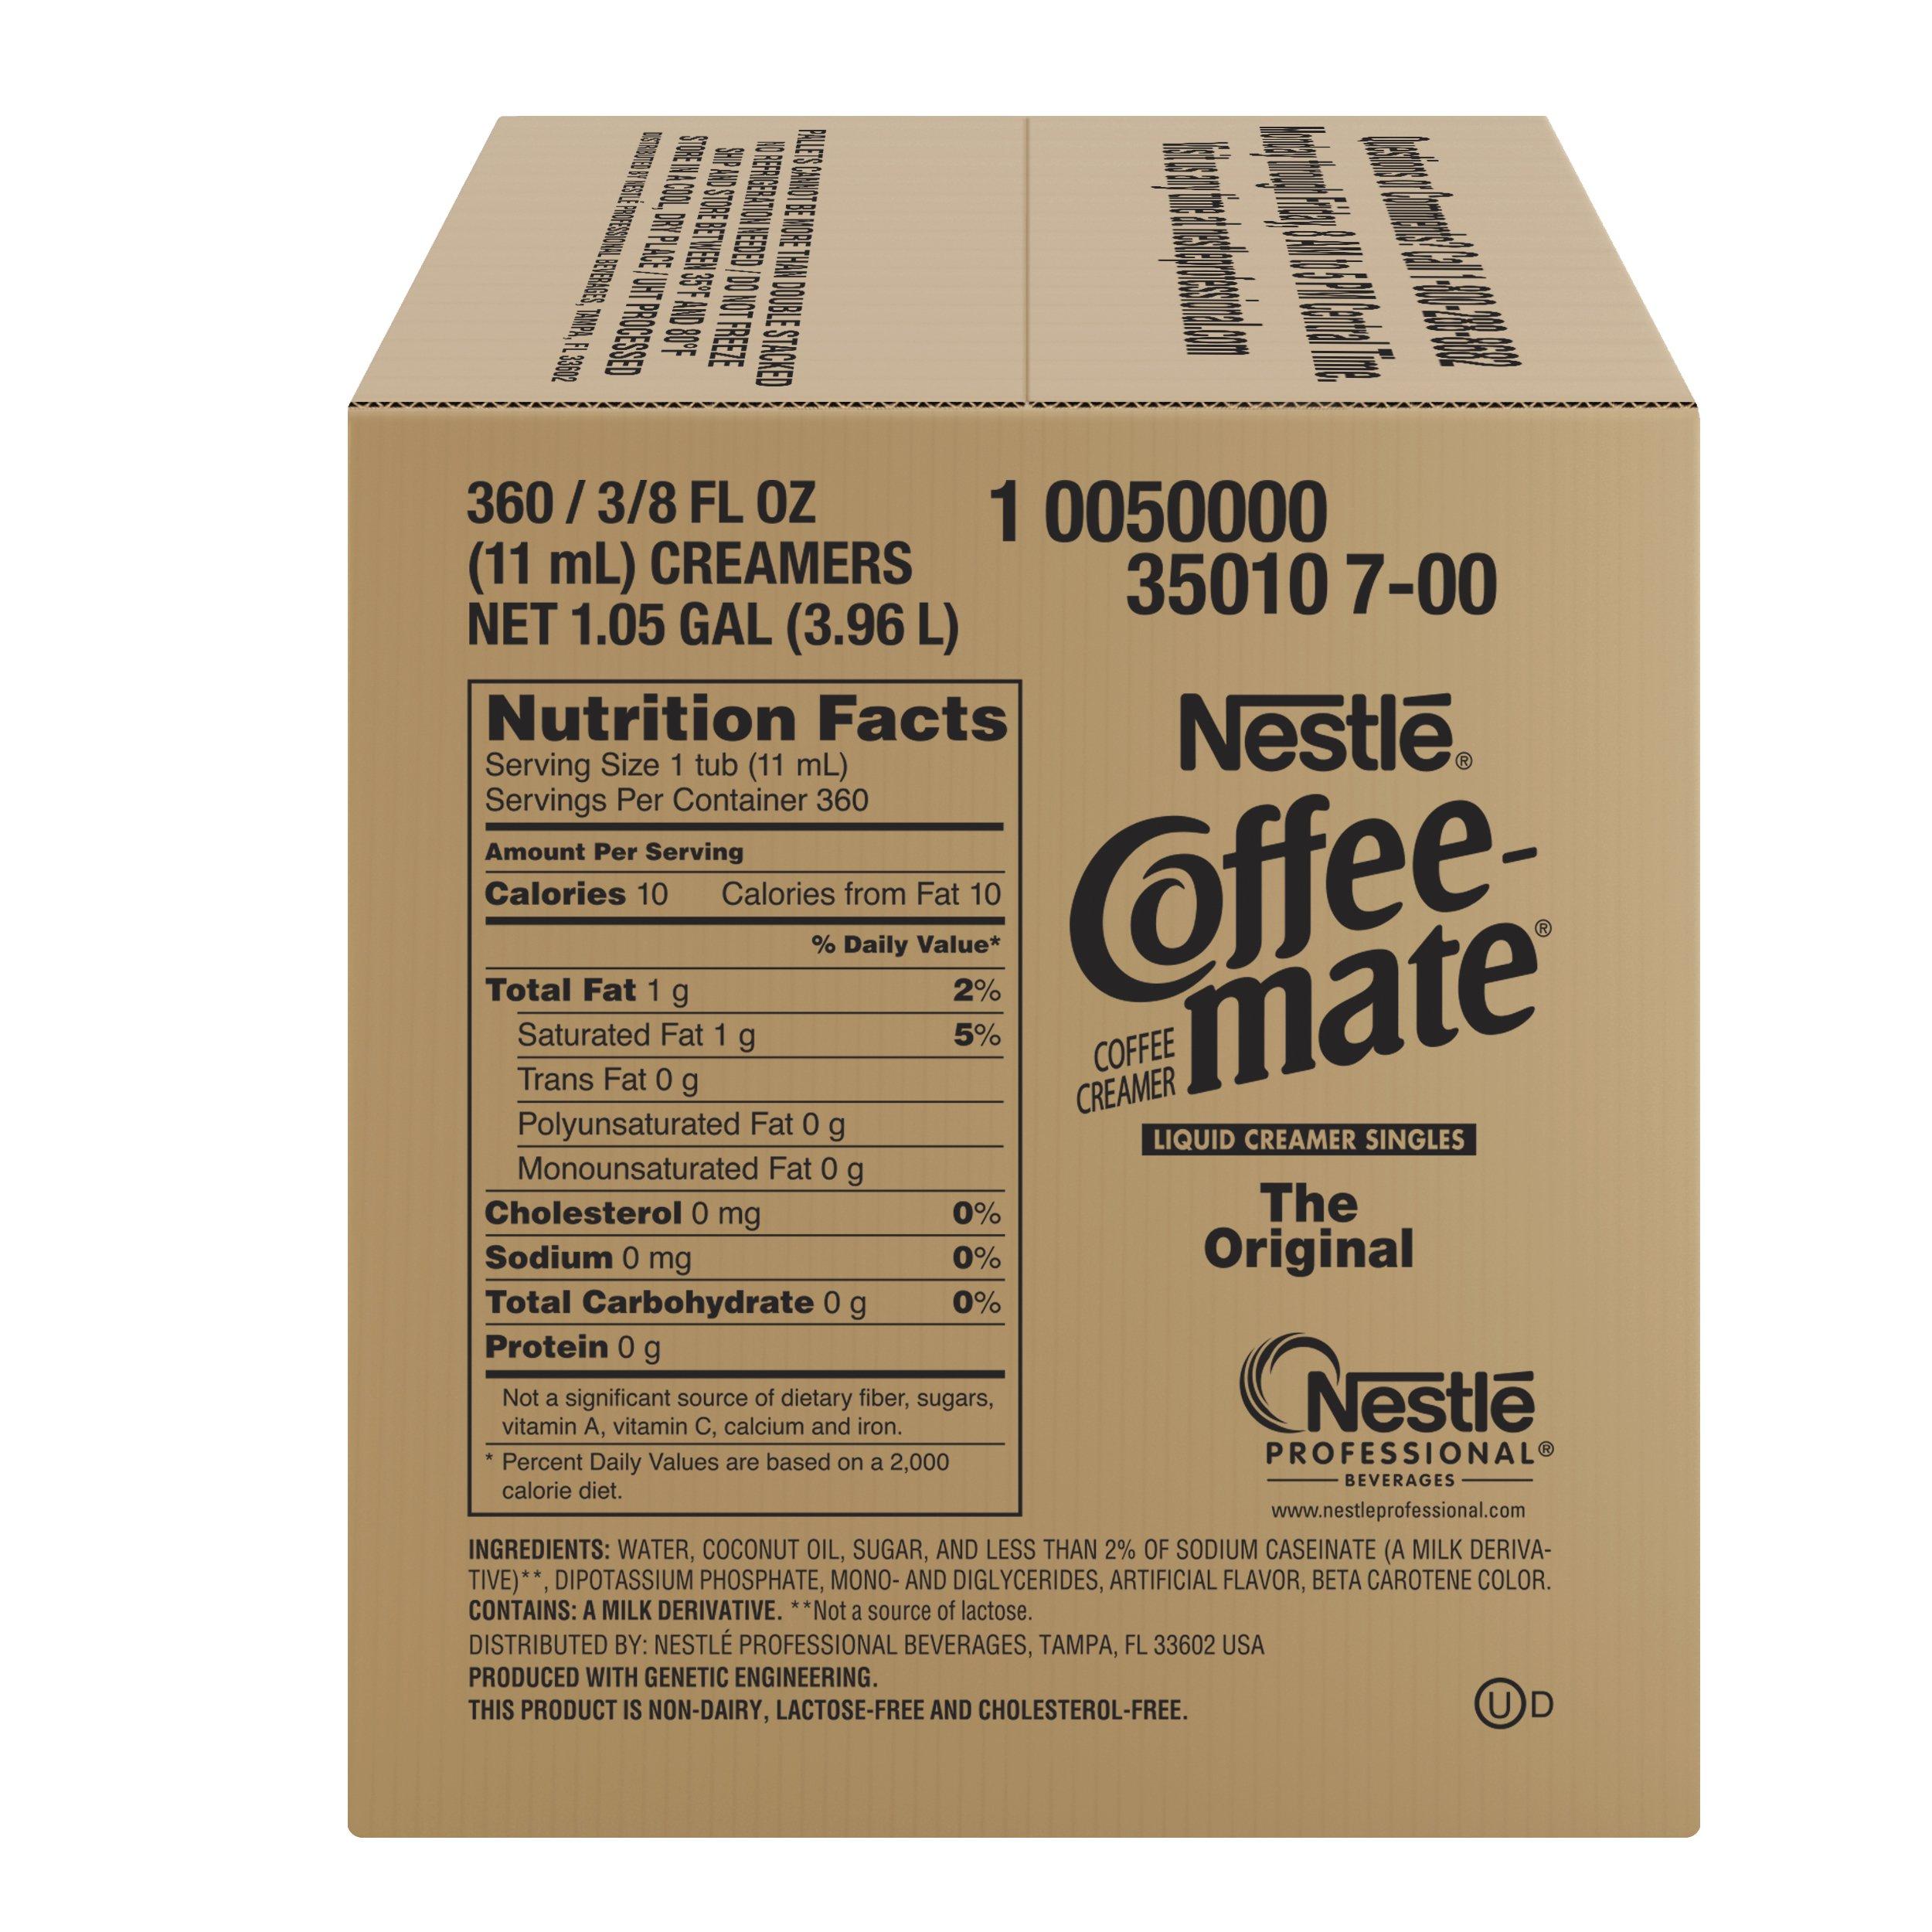 NESTLE COFFEE-MATE Coffee Creamer, Original, liquid creamer singles, 360 Count (Pack of 1) by Nestle Coffee Mate (Image #4)